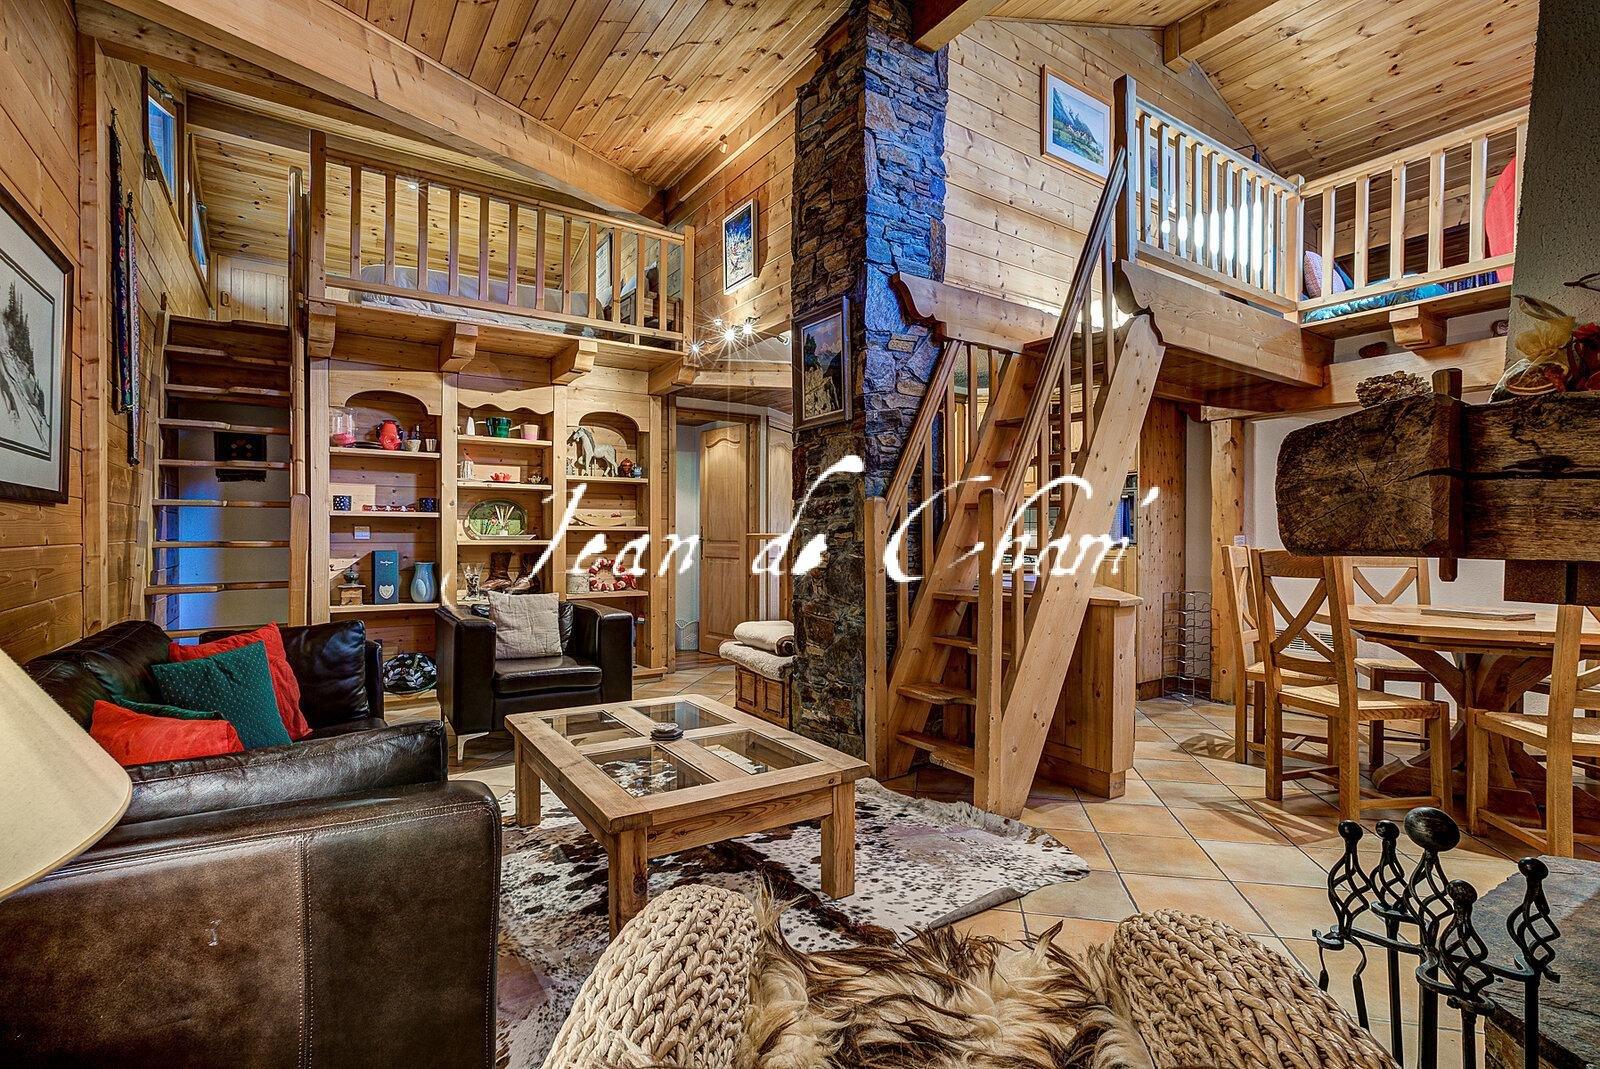 Сезонная аренда Квартира - Шамони́-Монбла́н (Chamonix-Mont-Blanc) Centre Ville